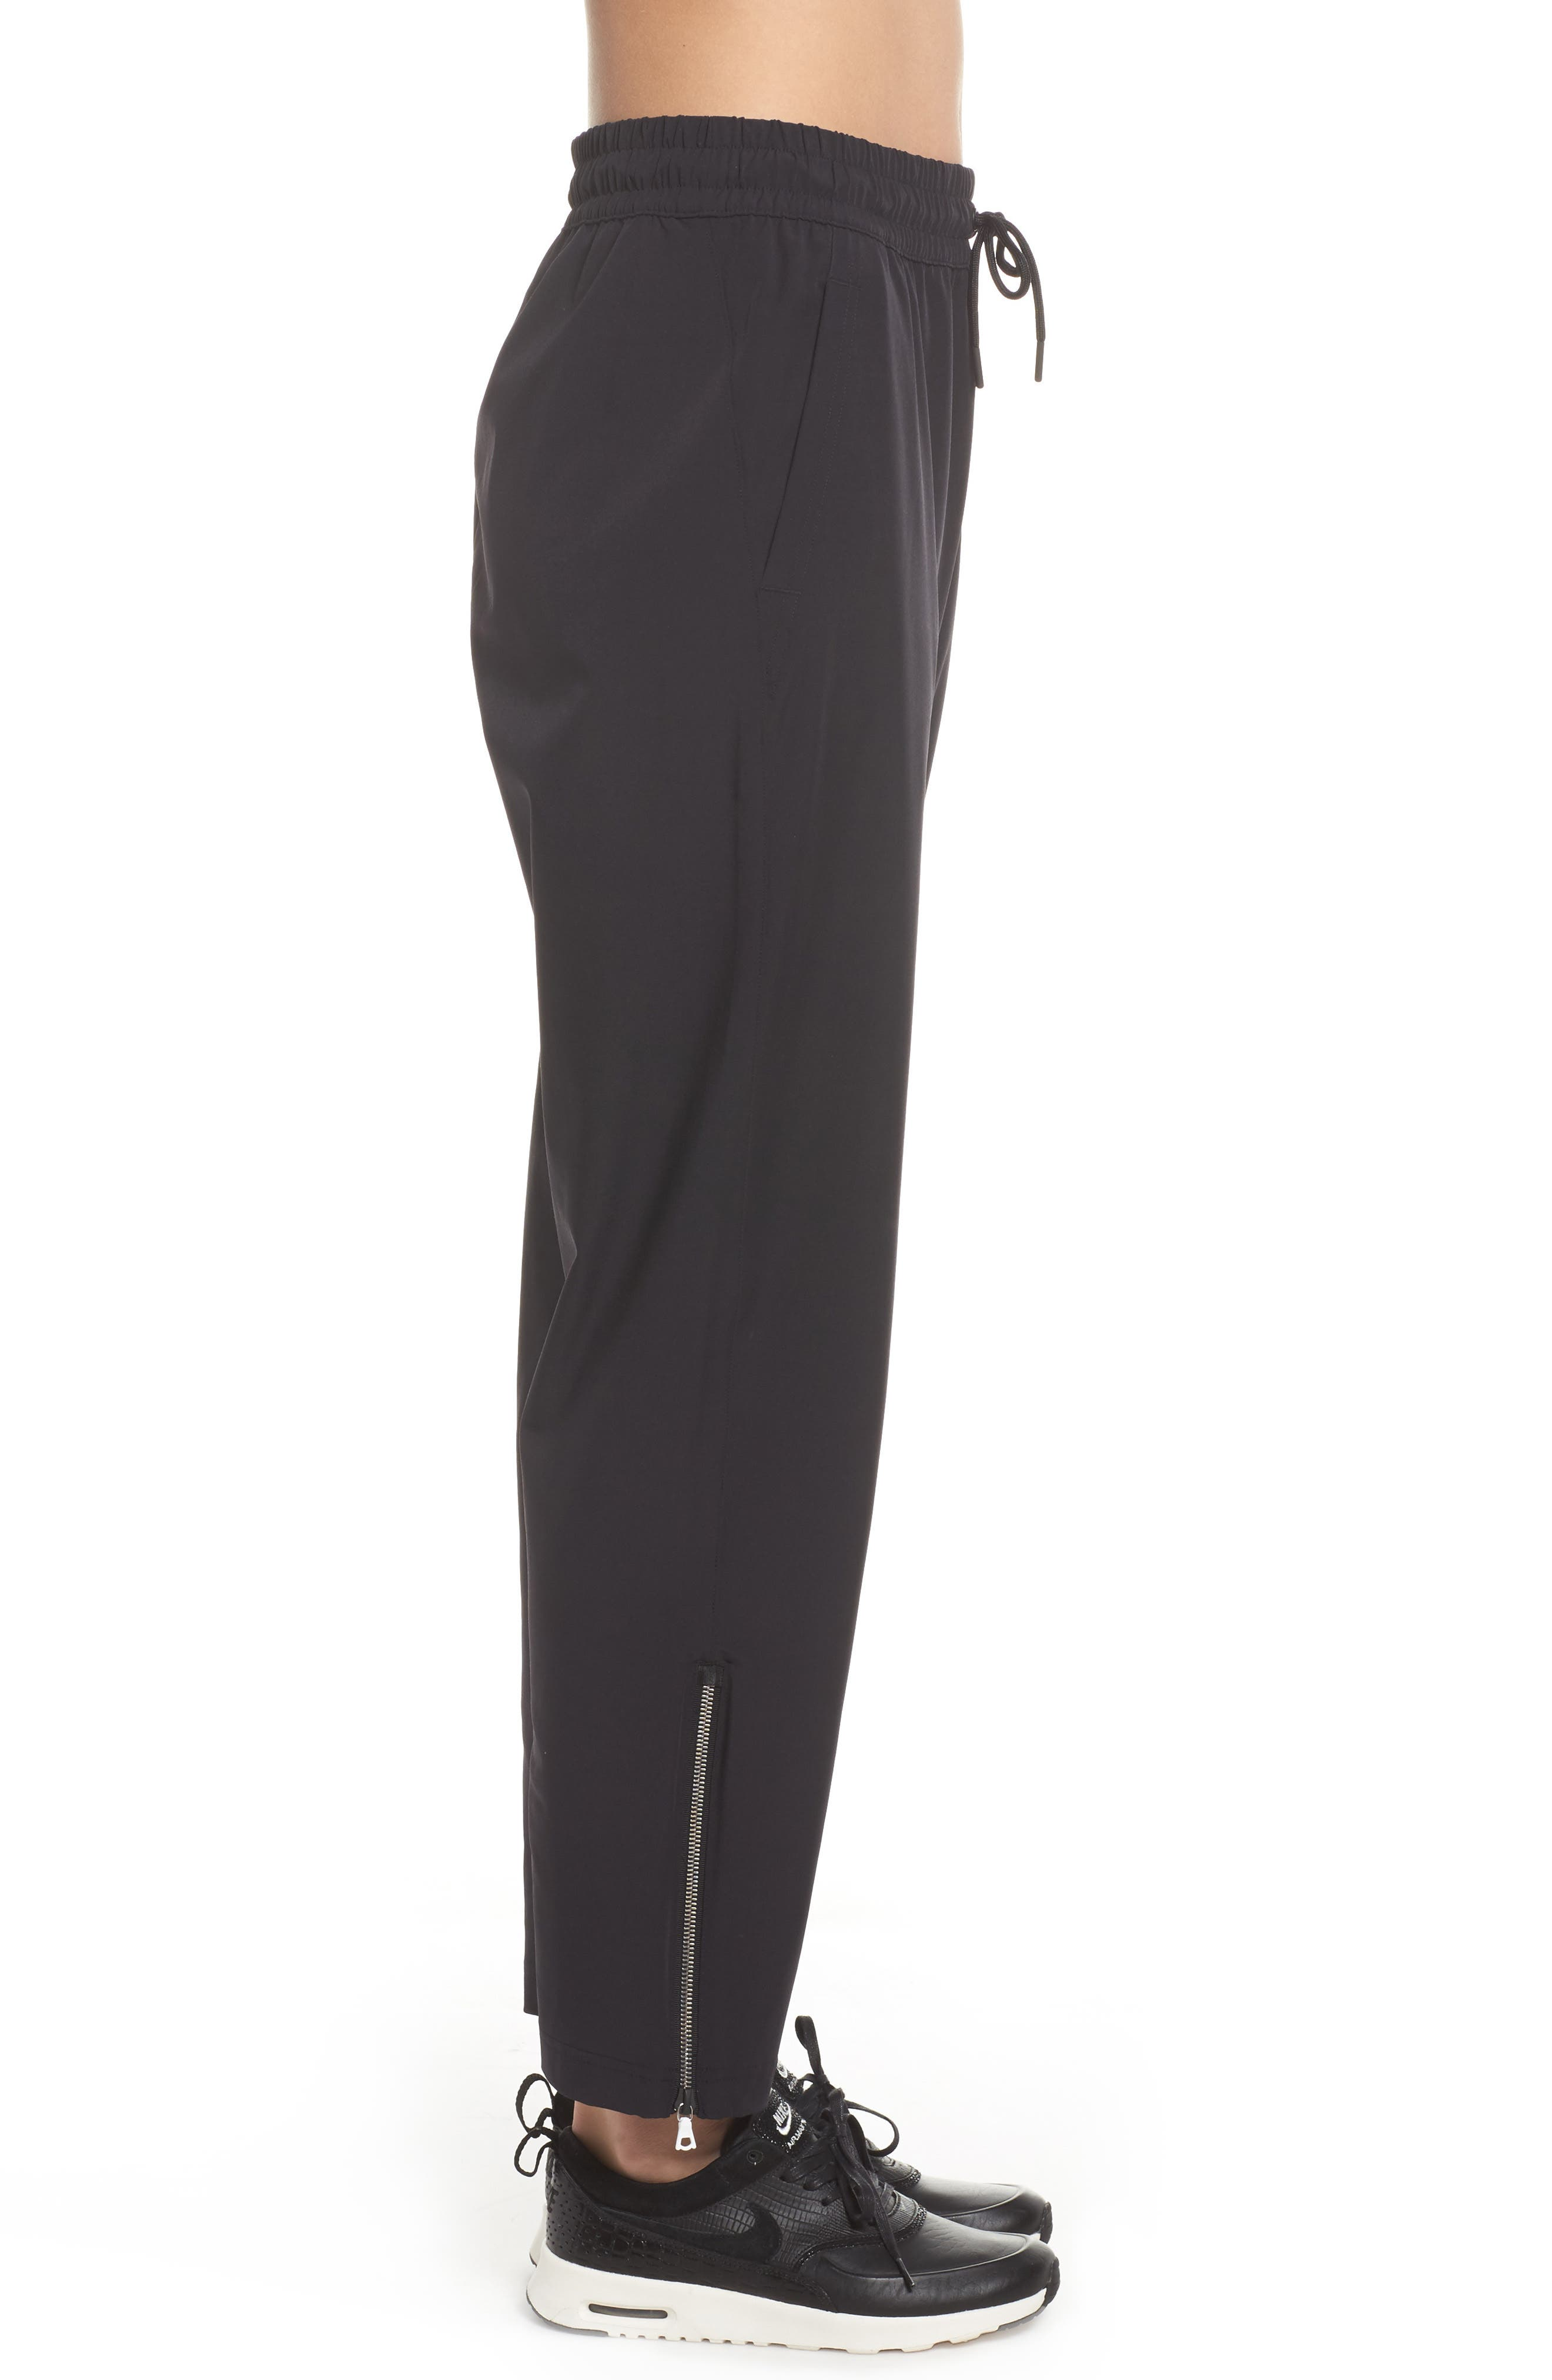 NikeLab Stretch Woven Training Pants,                             Alternate thumbnail 3, color,                             Black/ Black